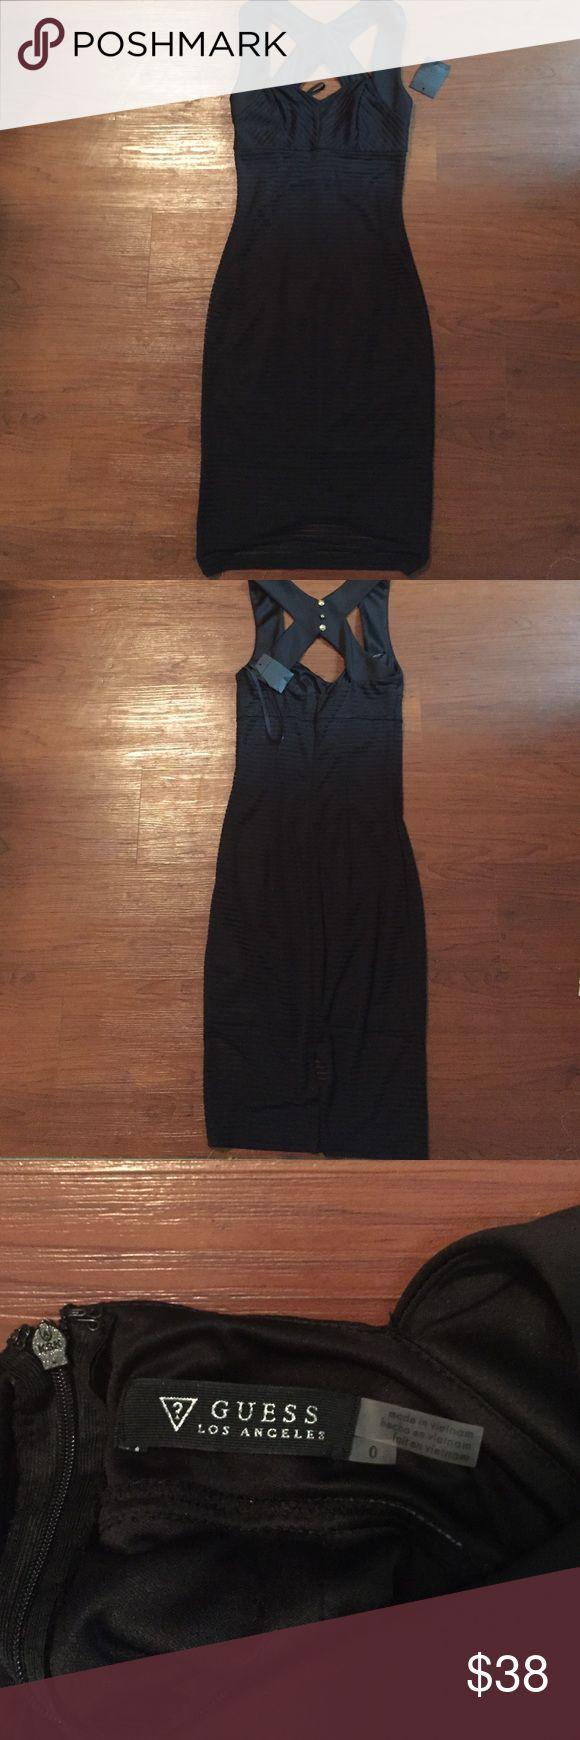 Guess dress Guess dress - size S GUESS Dresses Midi